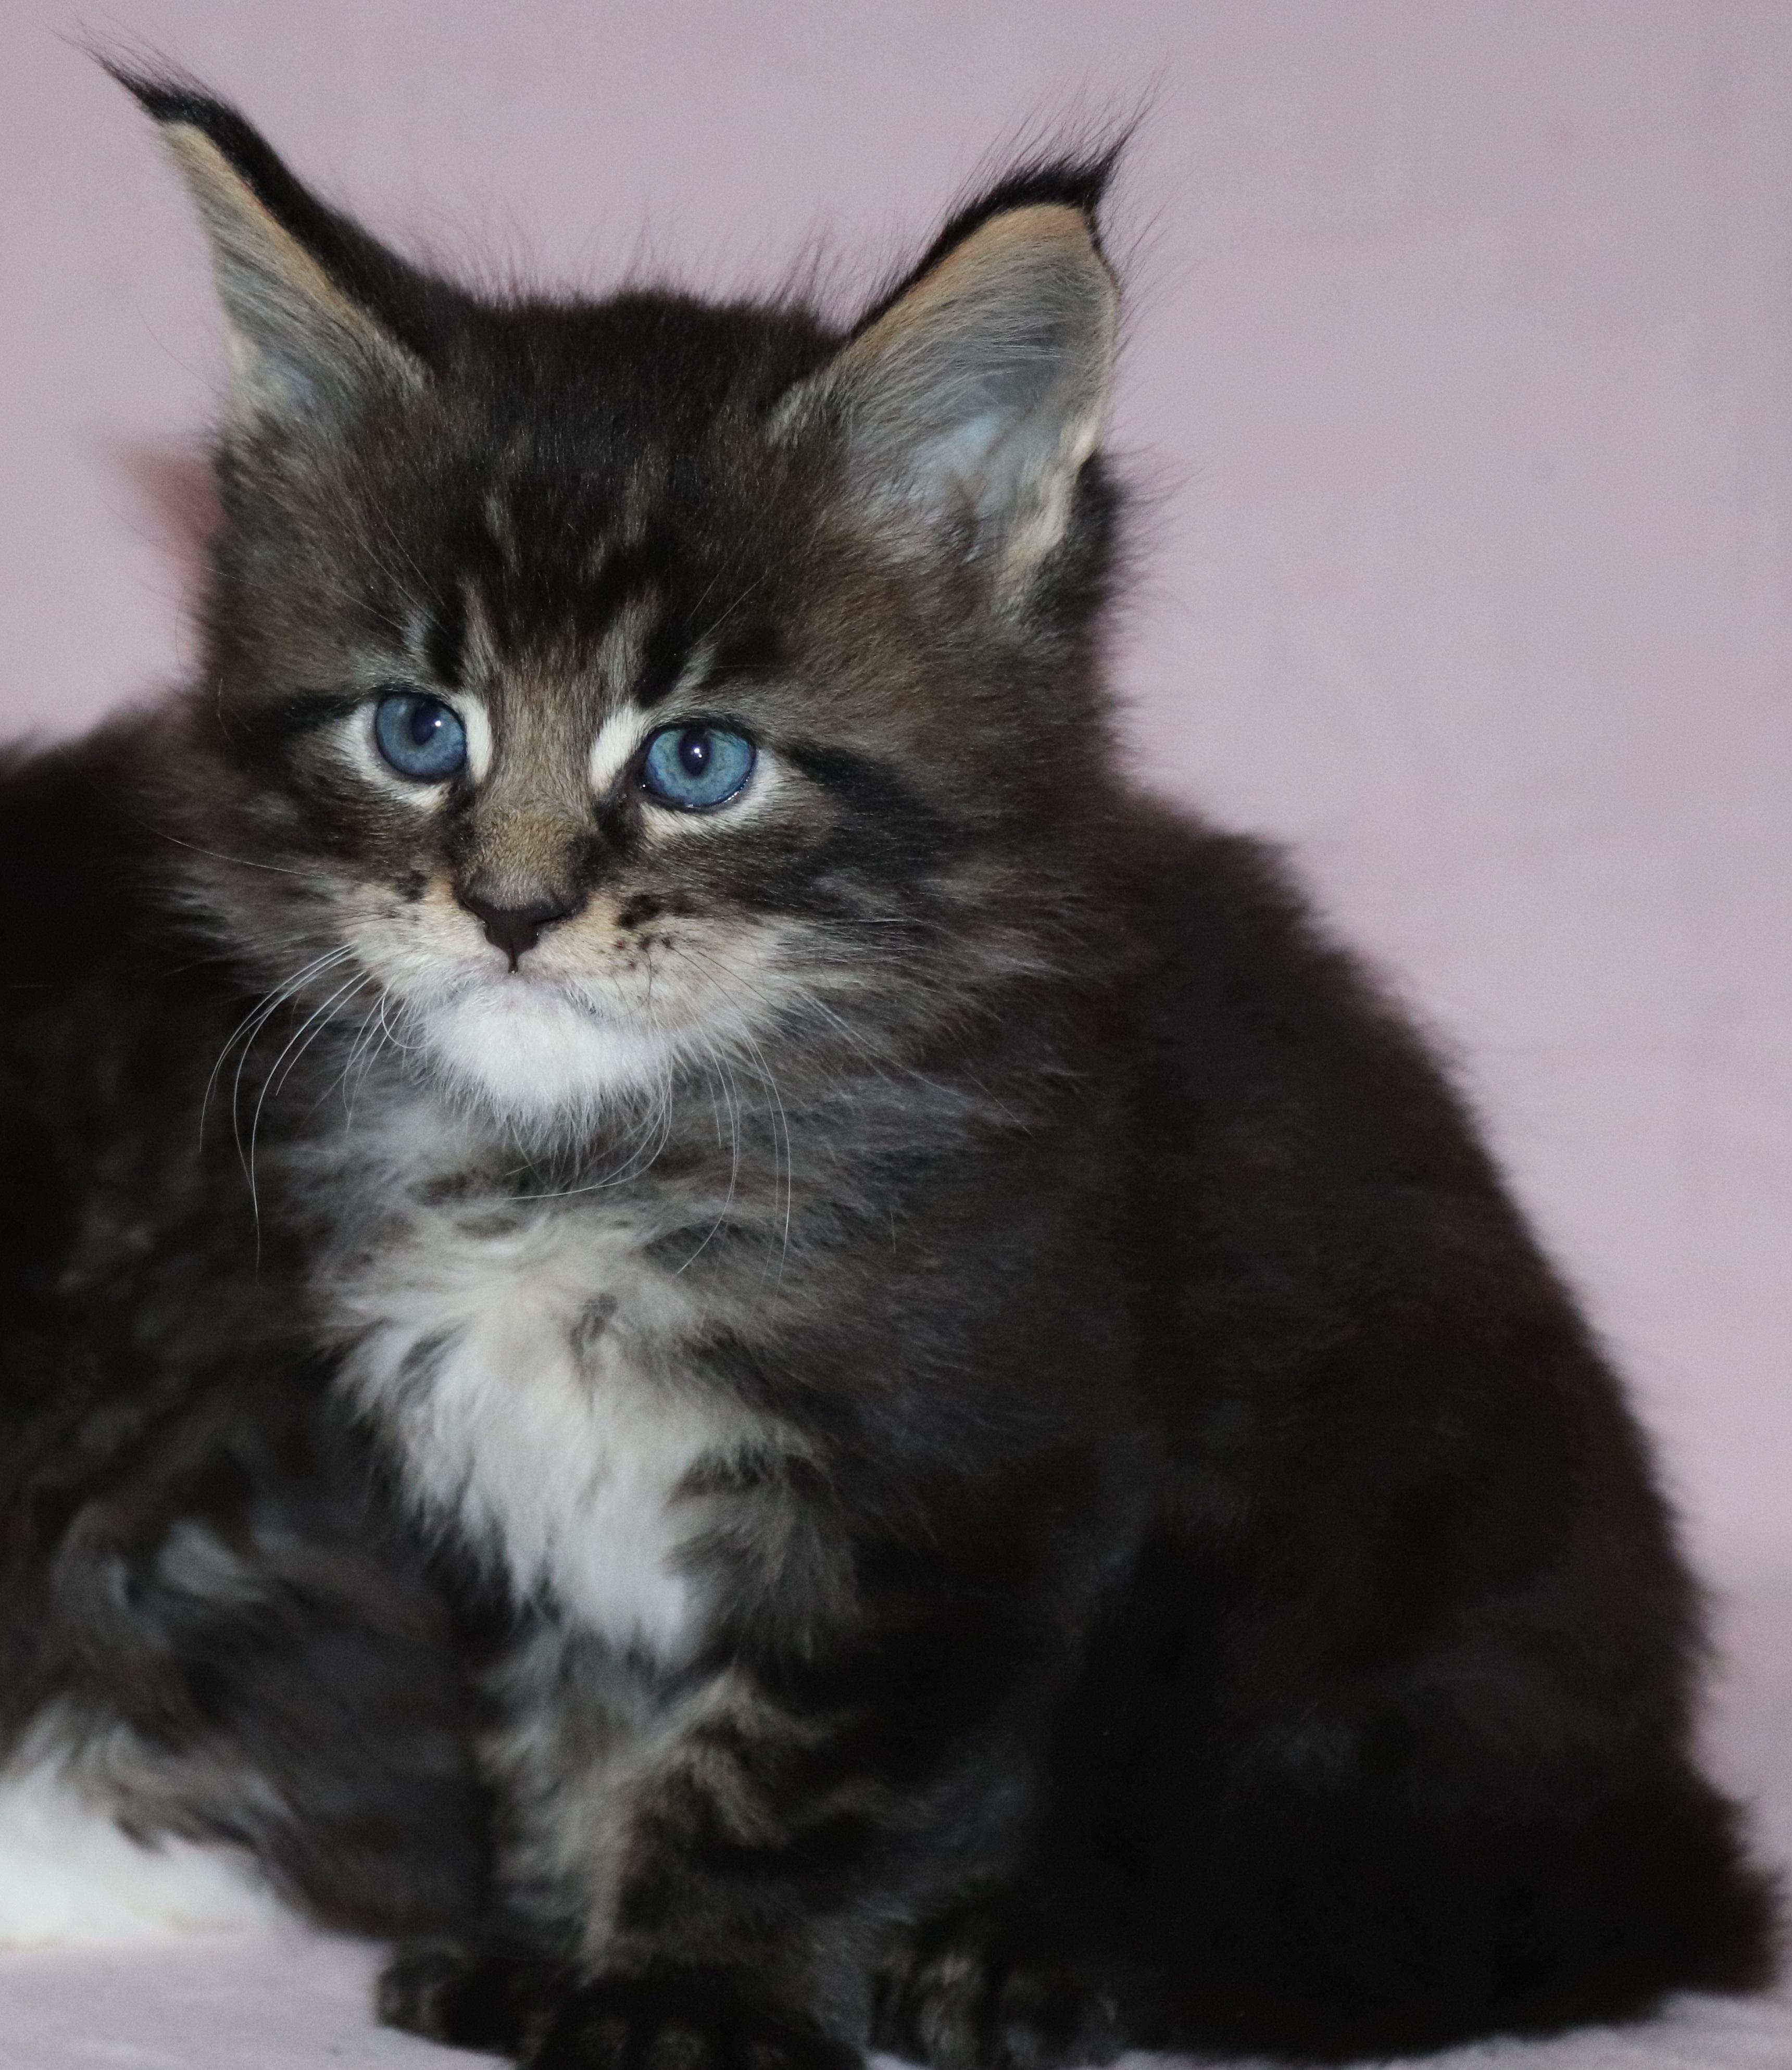 fotka kočky VRH H: HUGO von Erillian*CZ 👦🏻